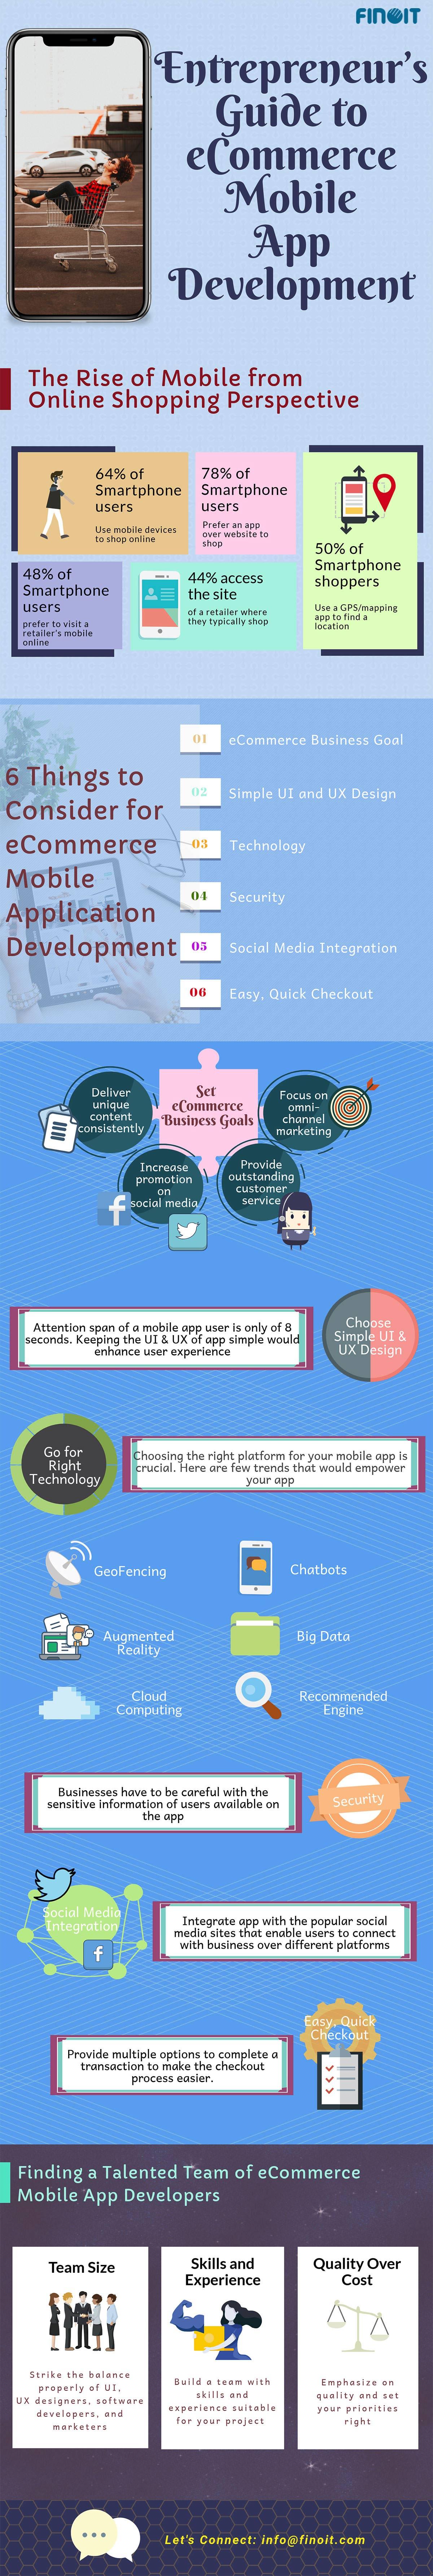 Entrepreneur's Guide to Ecommerce Mobile App Development Infographic